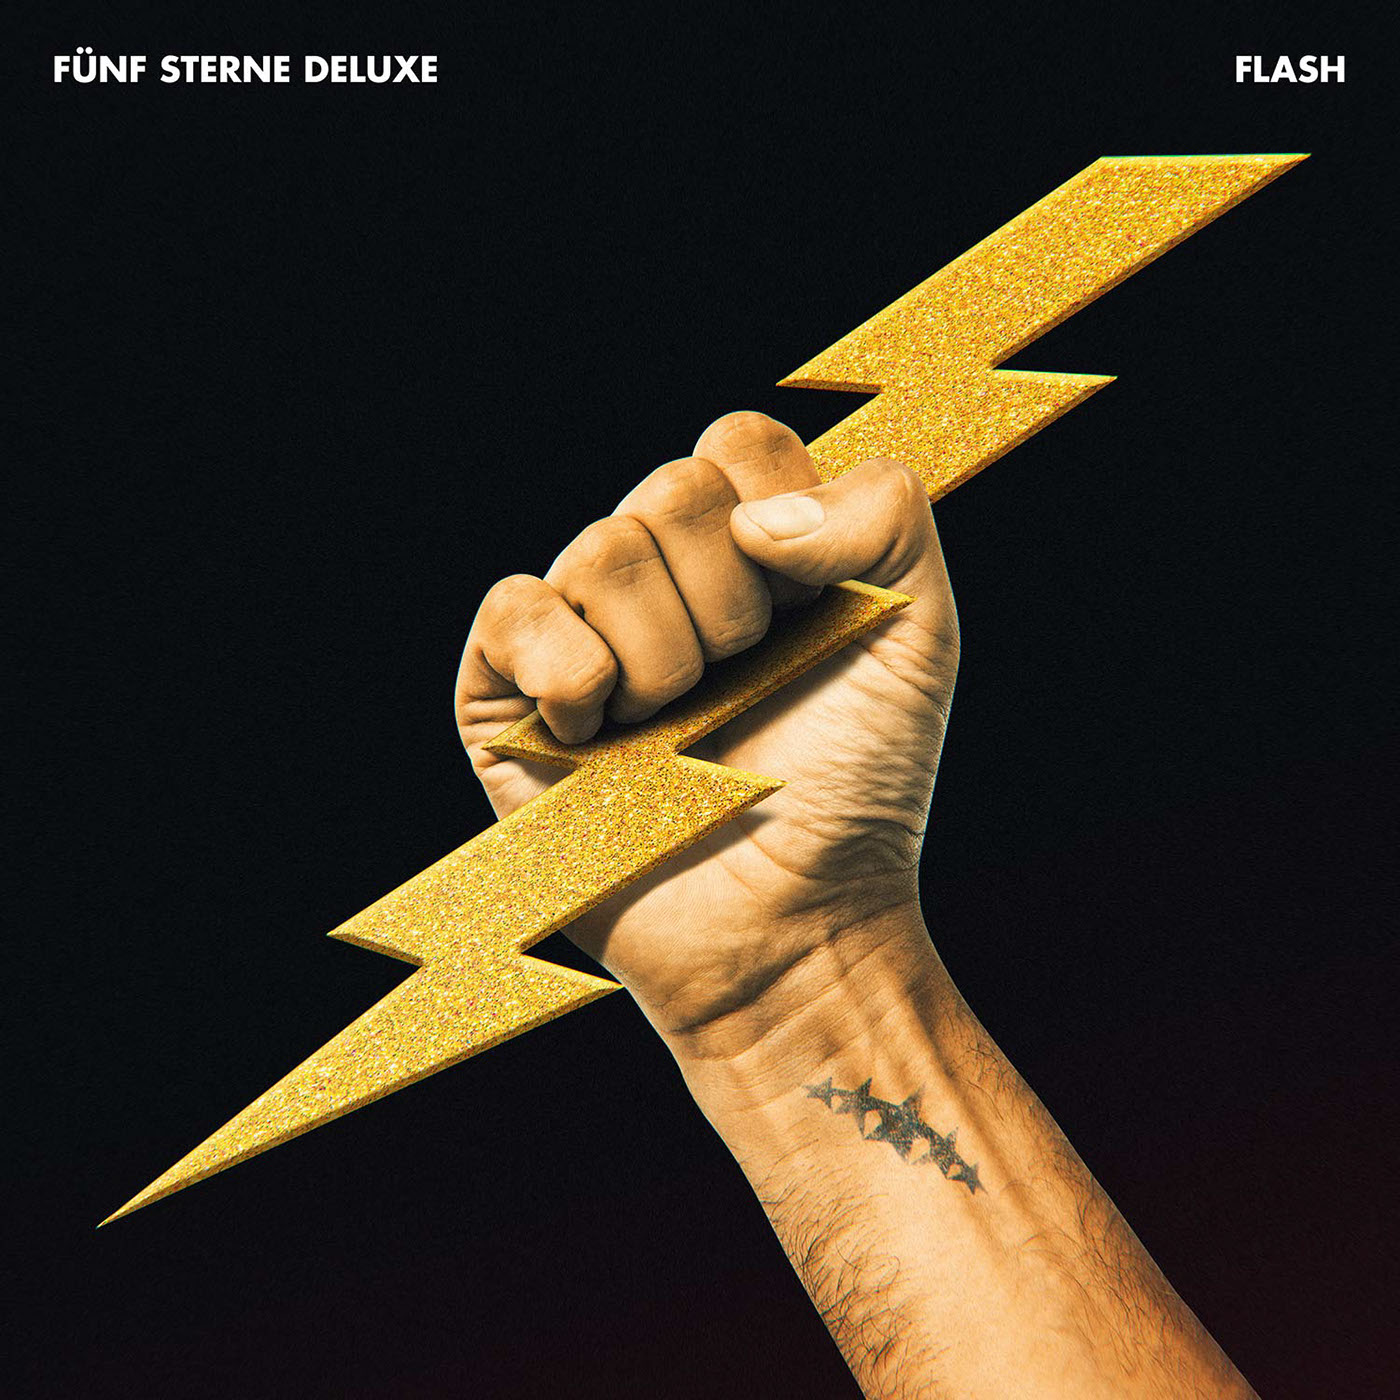 Fünf Sterne Deluxe Flash Download